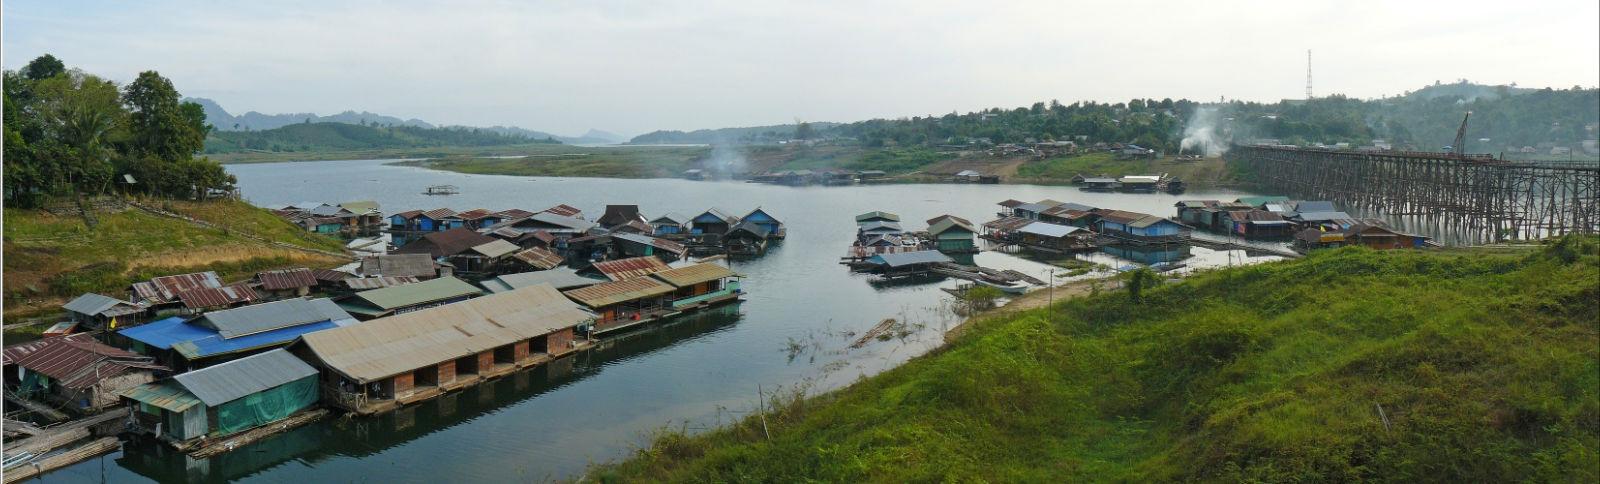 sangkhlaburi, Thailandia,foto di viaggi